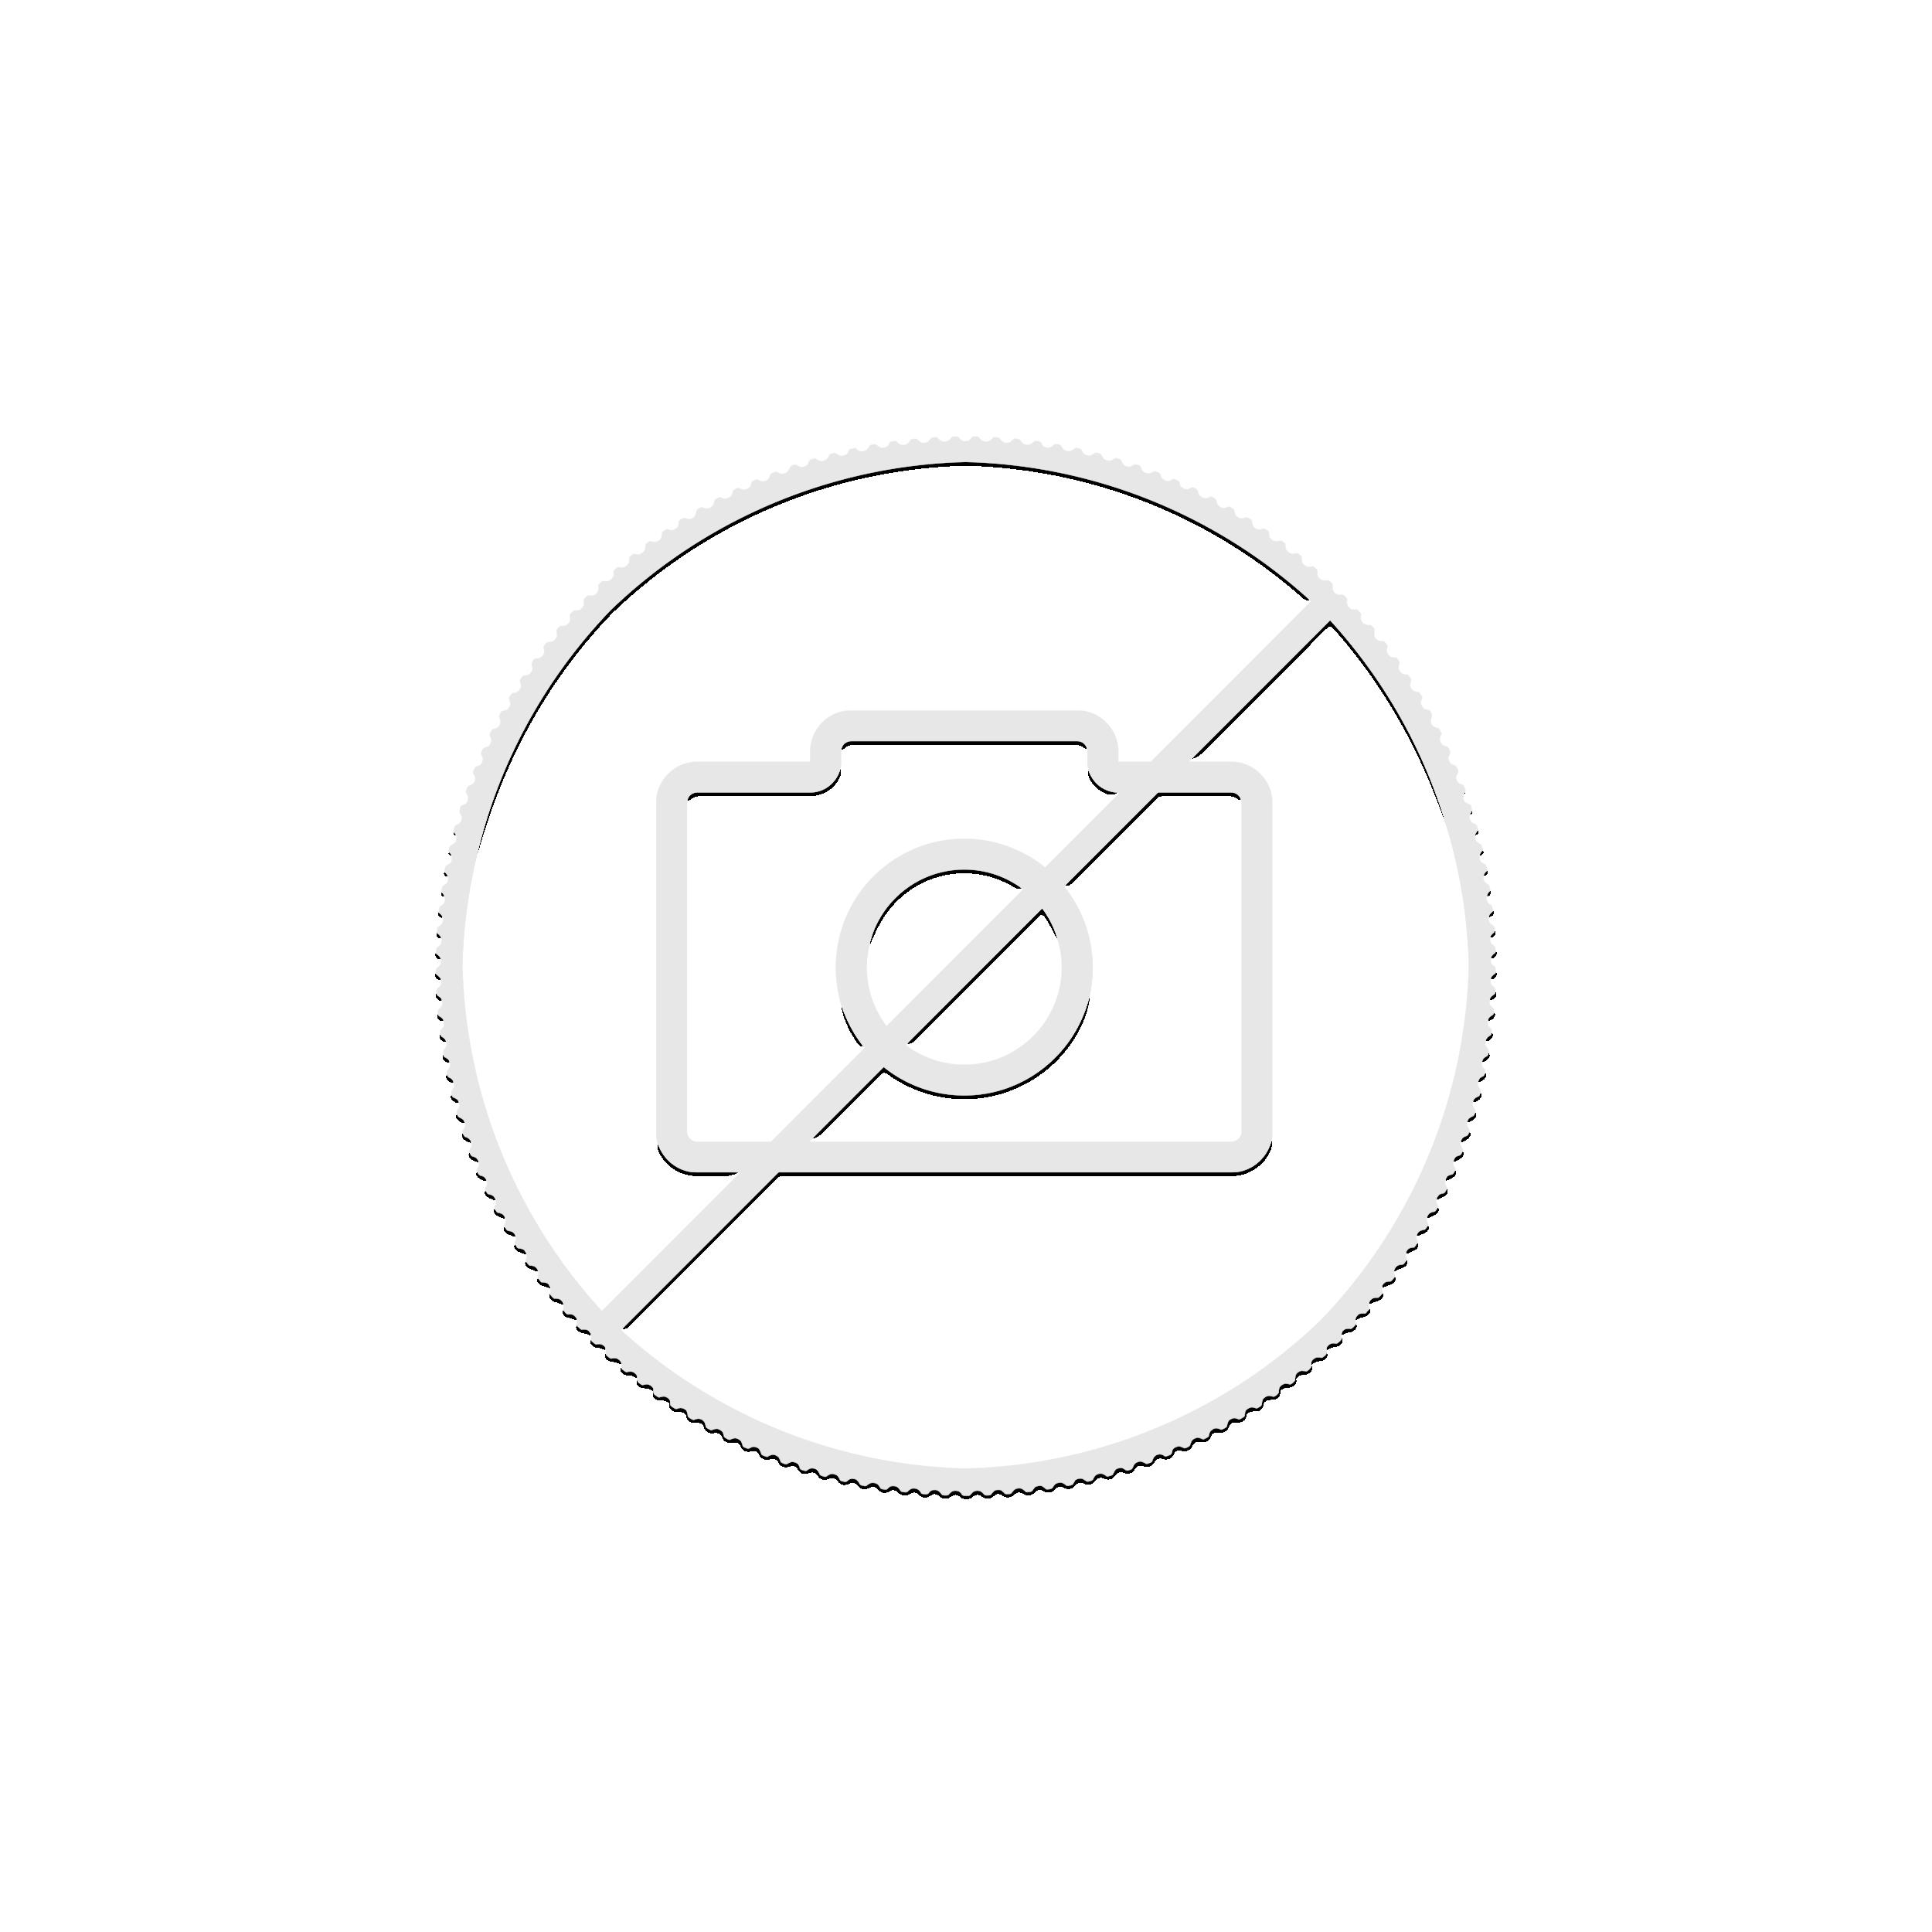 1 Troy ounce gouden munt UK Lunar 2014